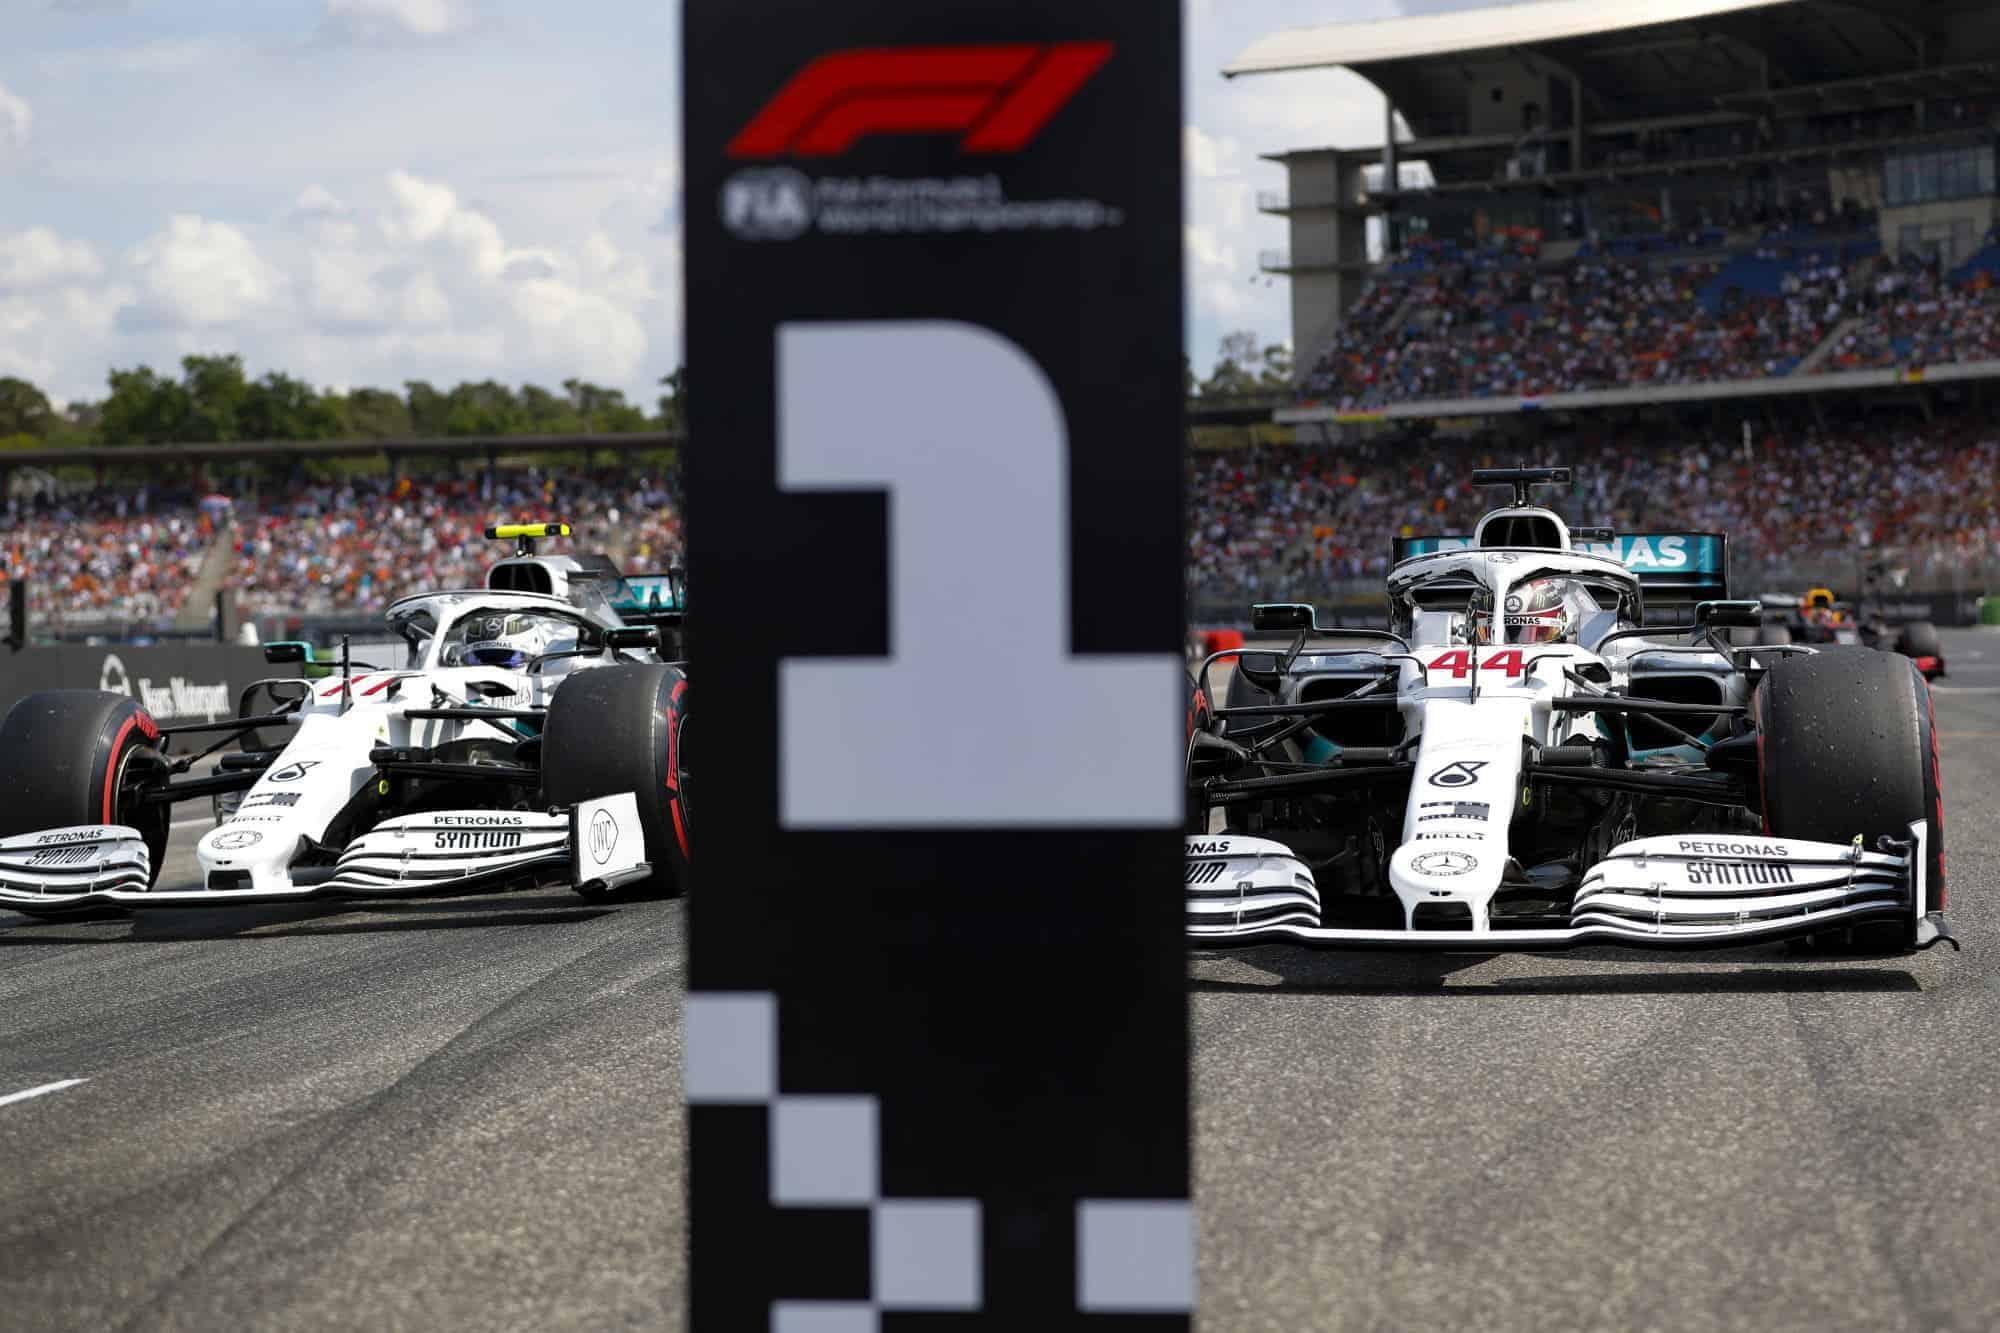 Hamilton Bottas German GP F1 2019 post qualifying on the track Photo Daimler